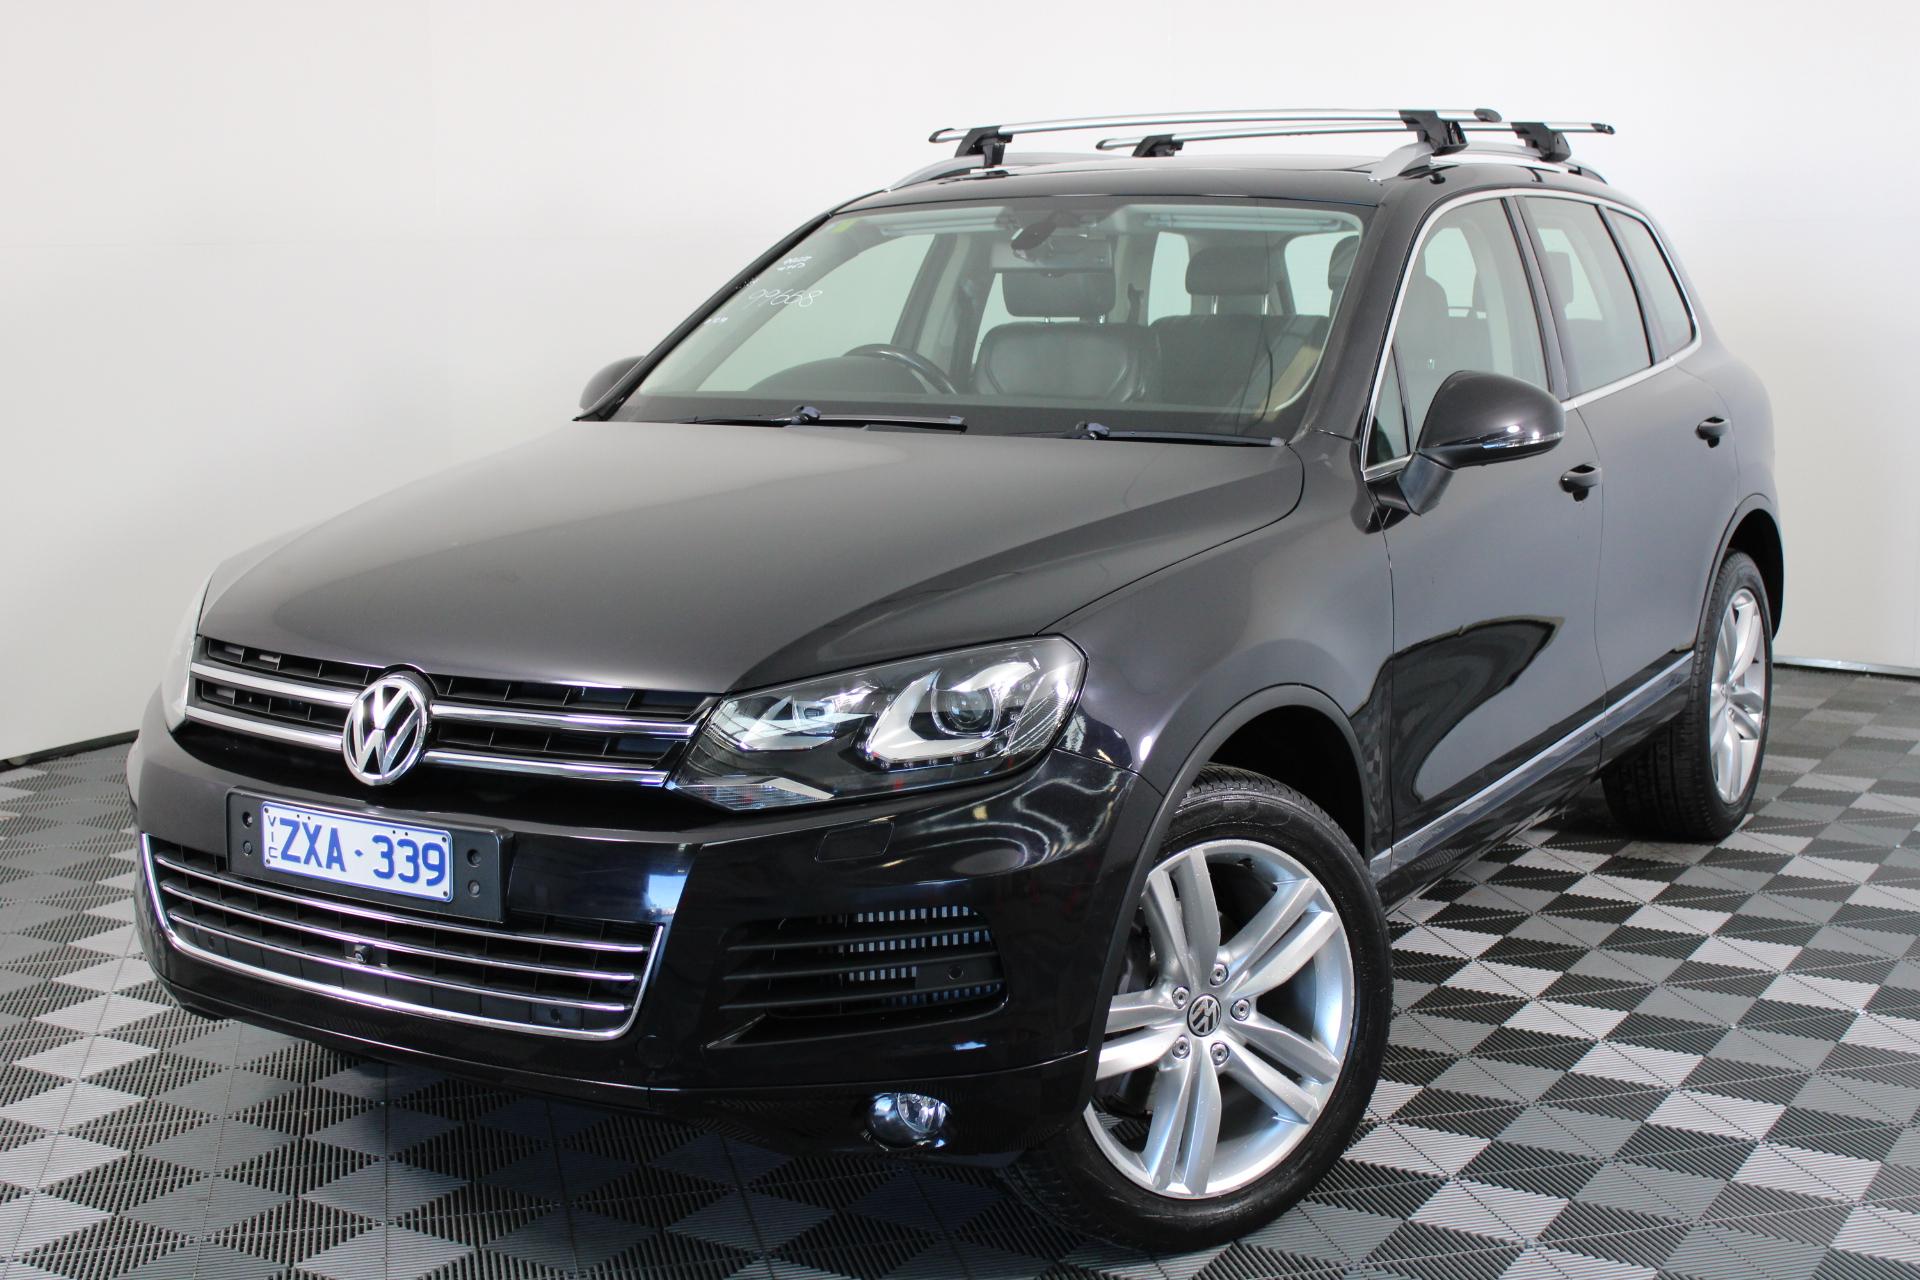 2013 Volkswagen Touareg V6 TDI 7P Turbo Diesel Automatic - 8 Speed Wagon